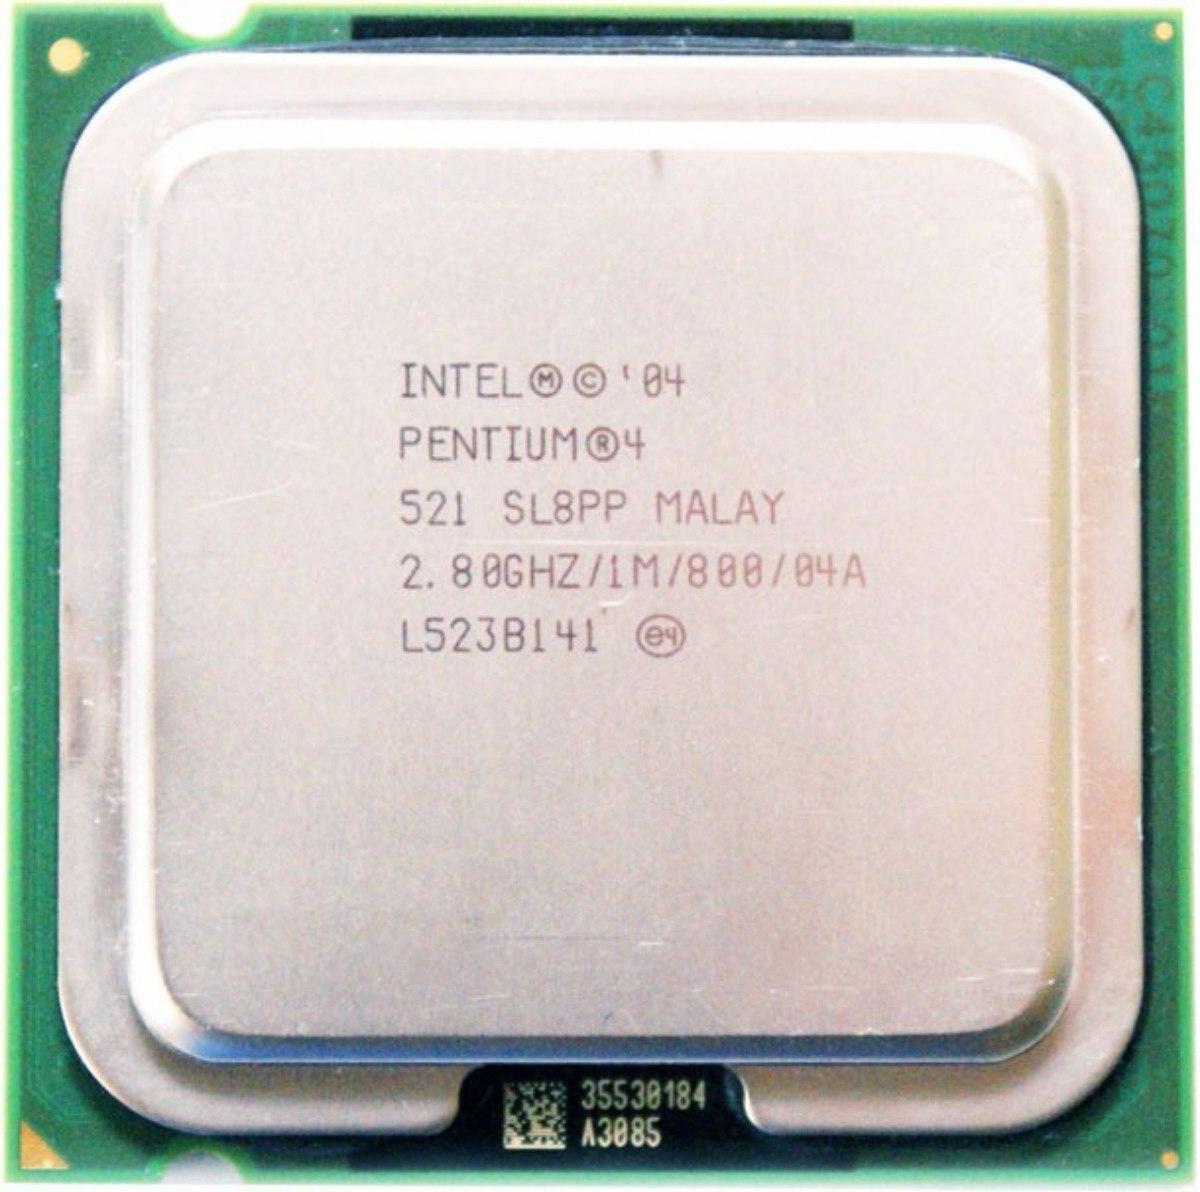 Процессор Intel Pentium 4 521 2.80GHz/1M/800 (SL8PP) s775, tray